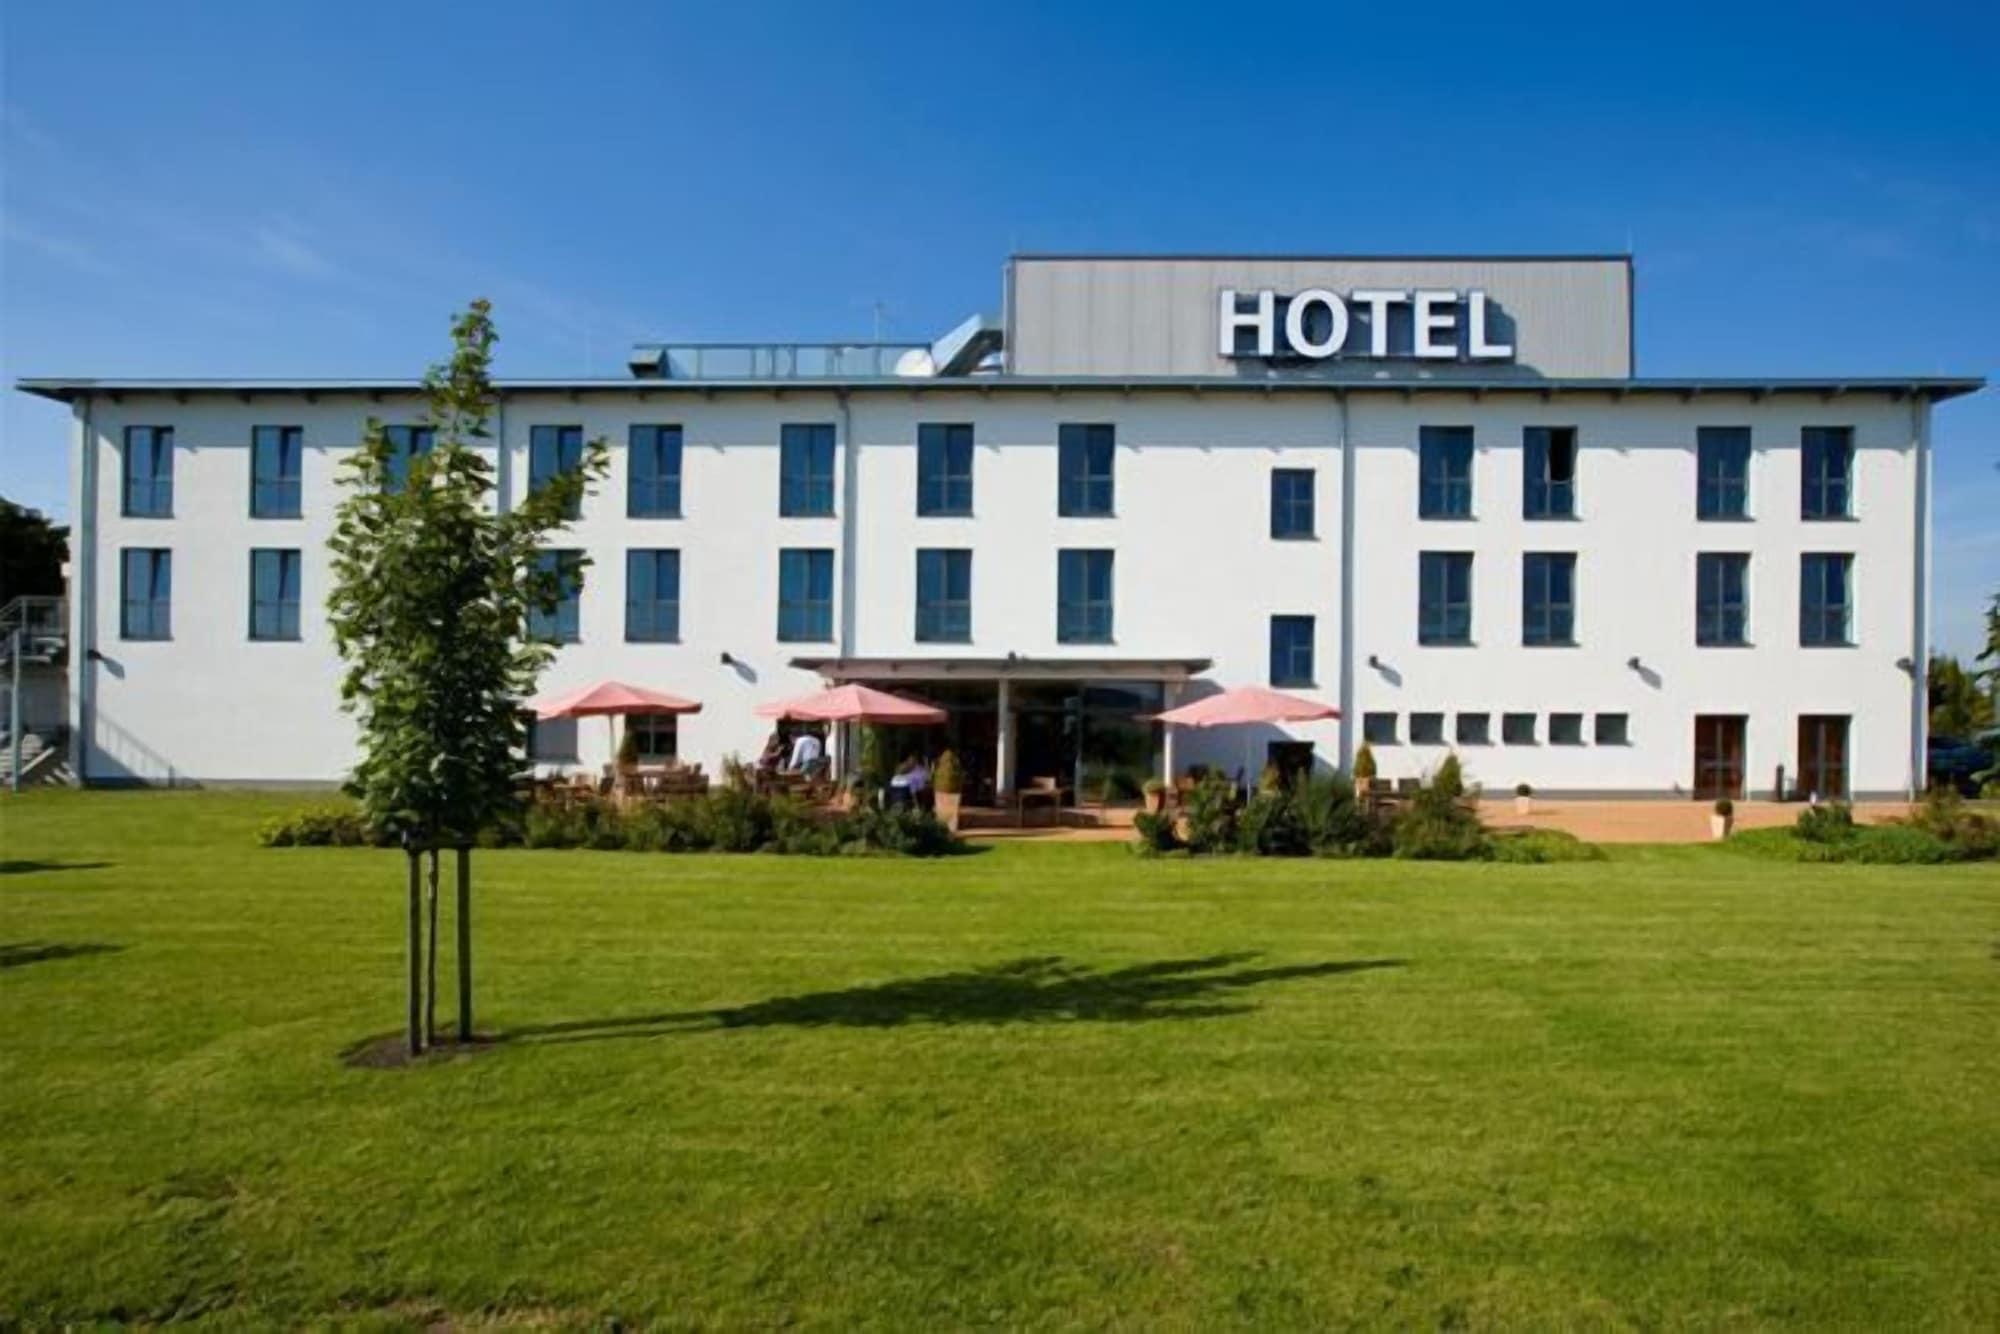 Airport Hotel Paderborn, Paderborn